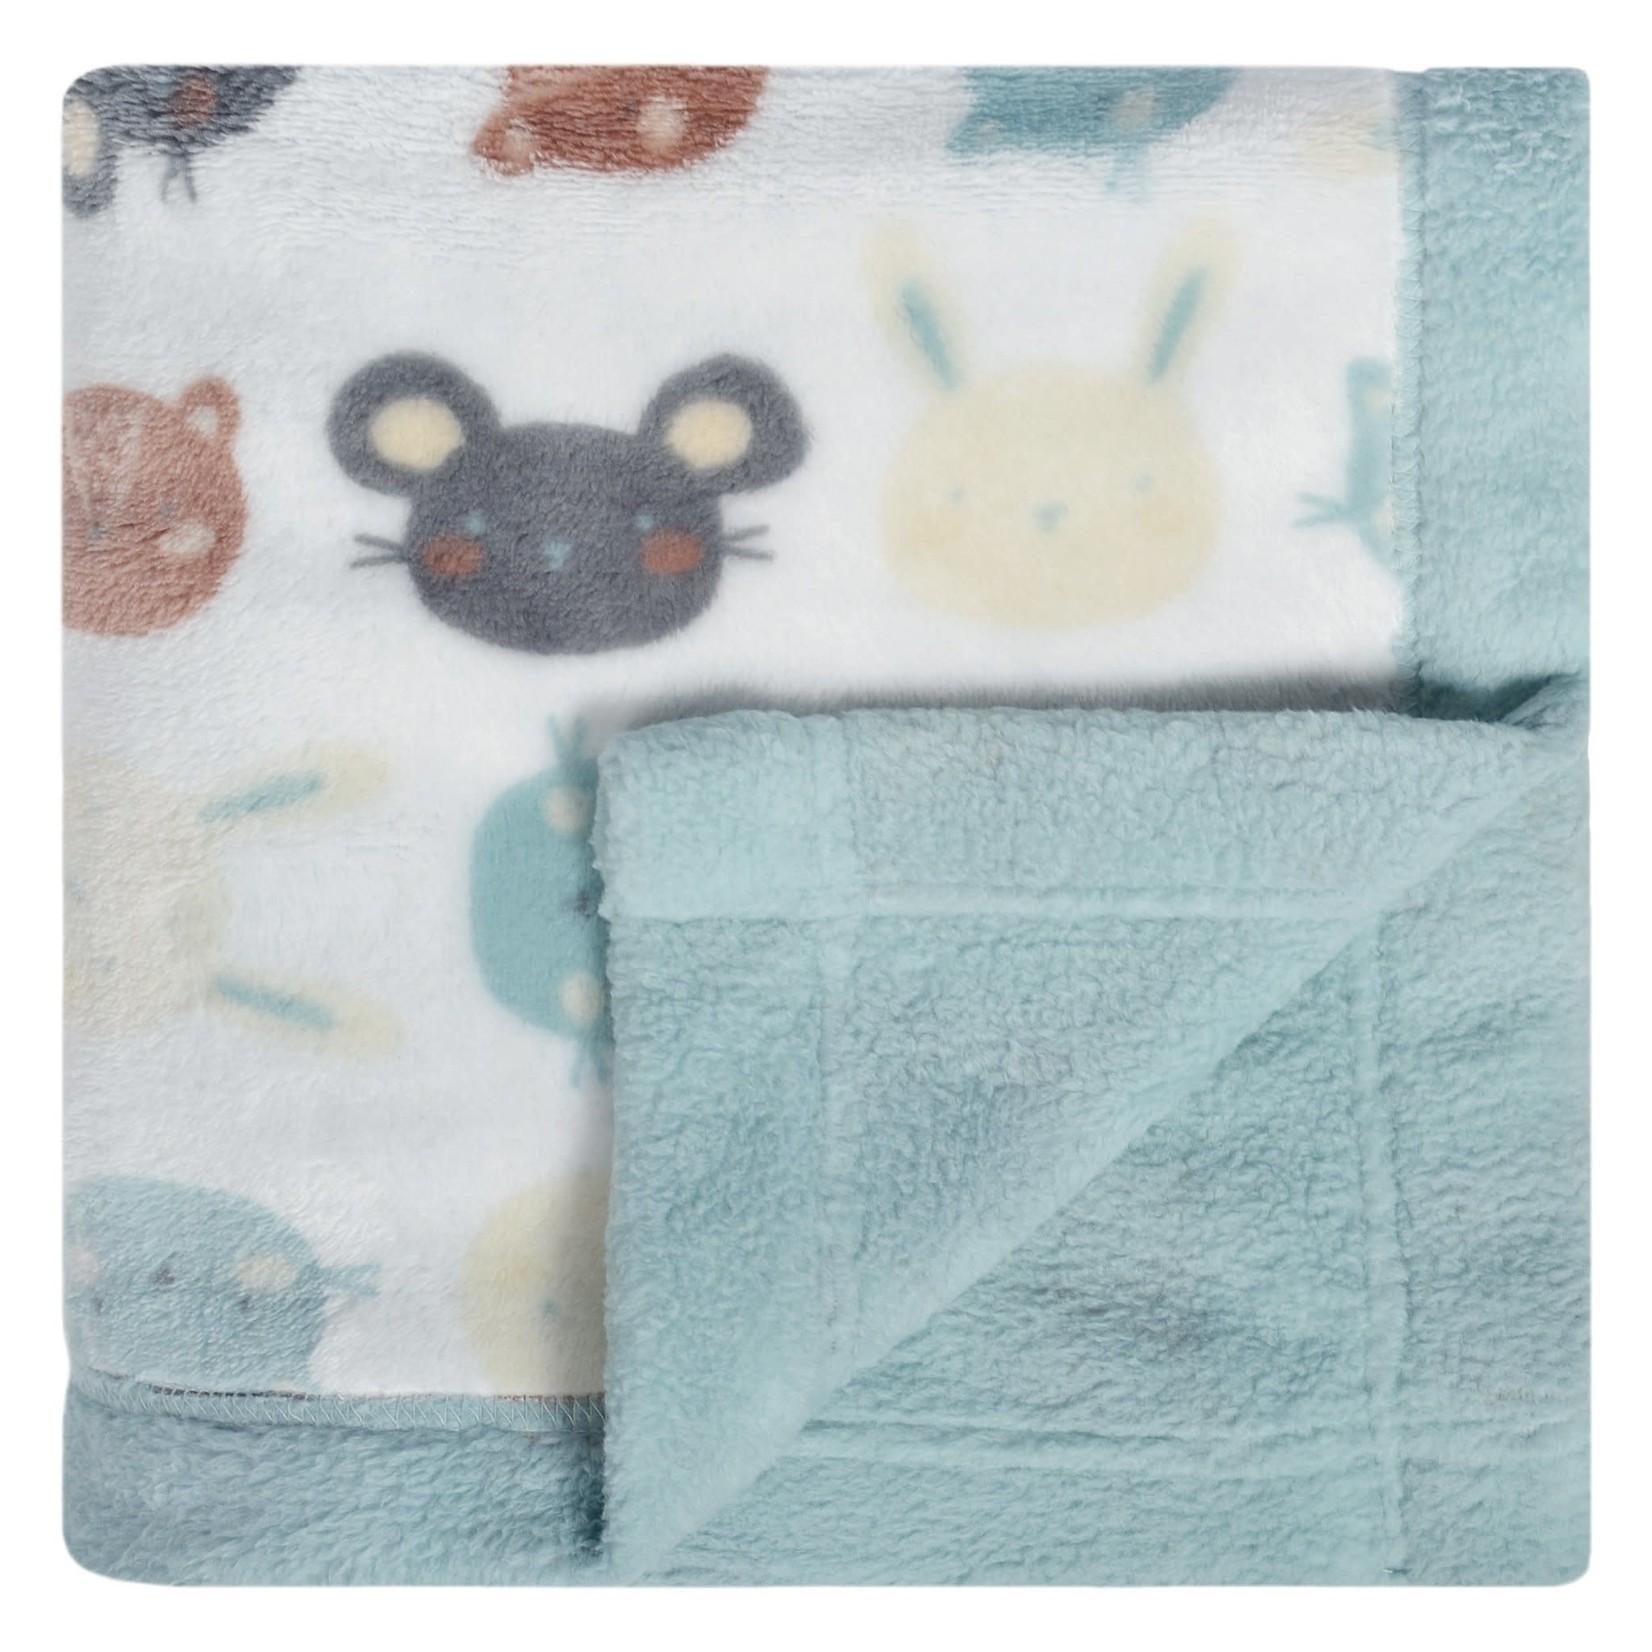 Plush Blanket - Faces